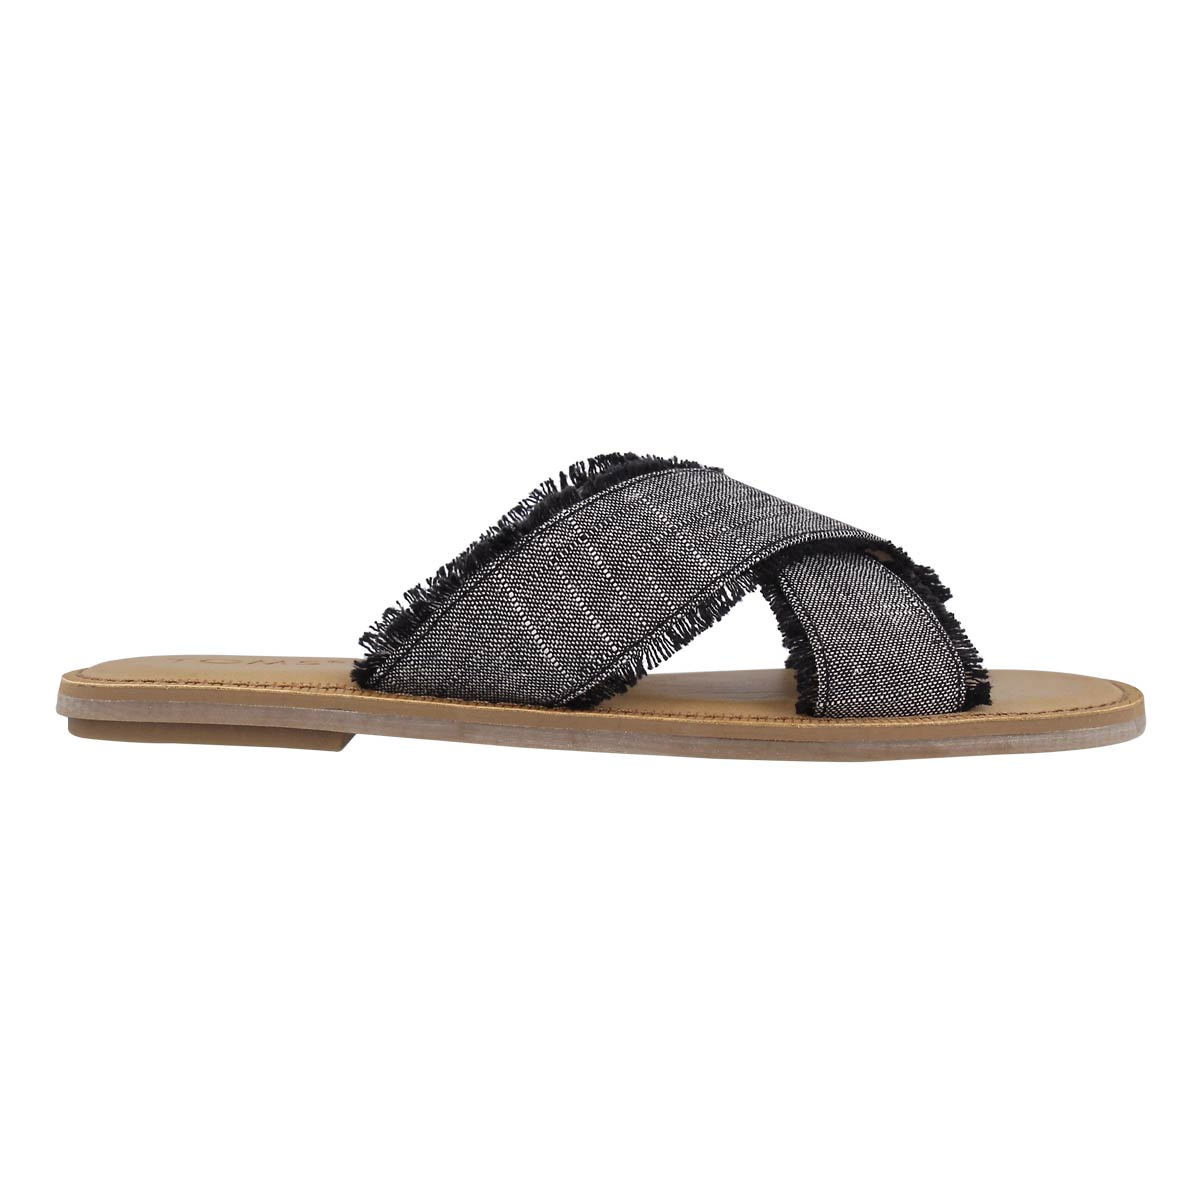 Lds Viv black casual slide sandal